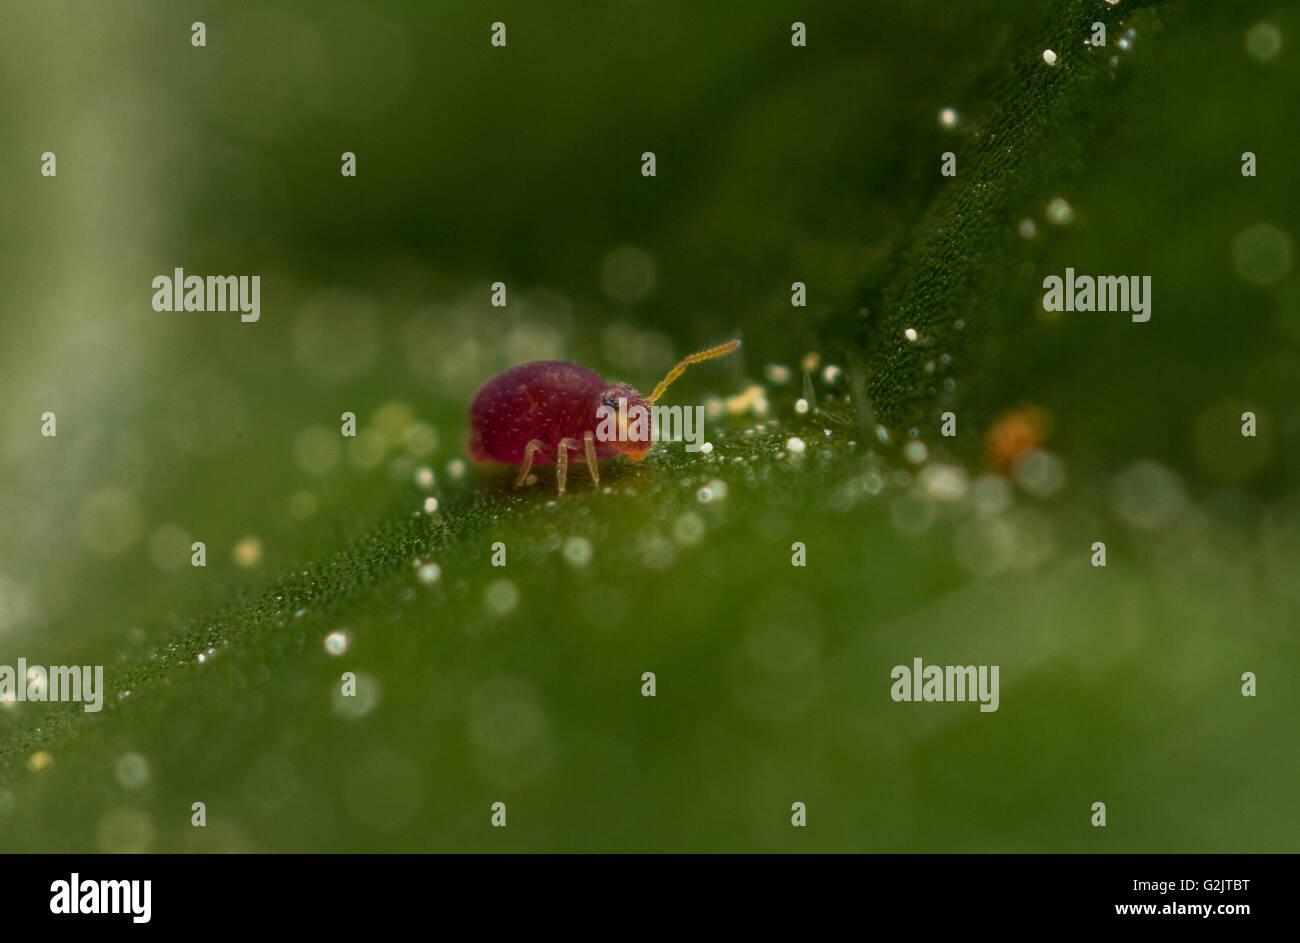 Deuterosminthurus pallipes globular springtails on acanthus leaves - Stock Image